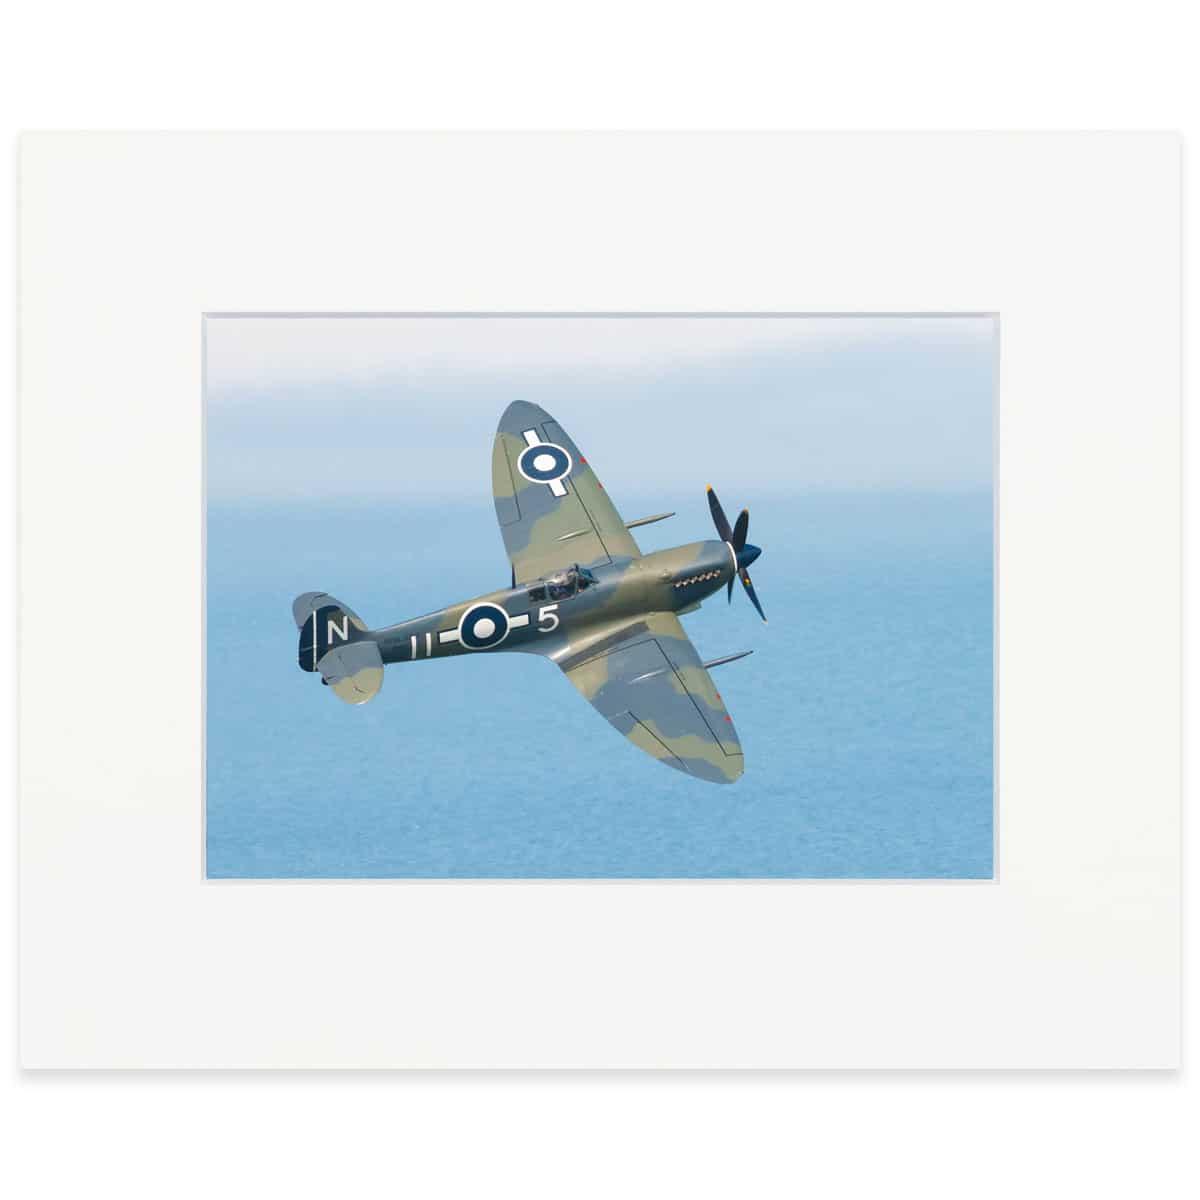 "Supermarine Seafire 8"" x 10"" print"